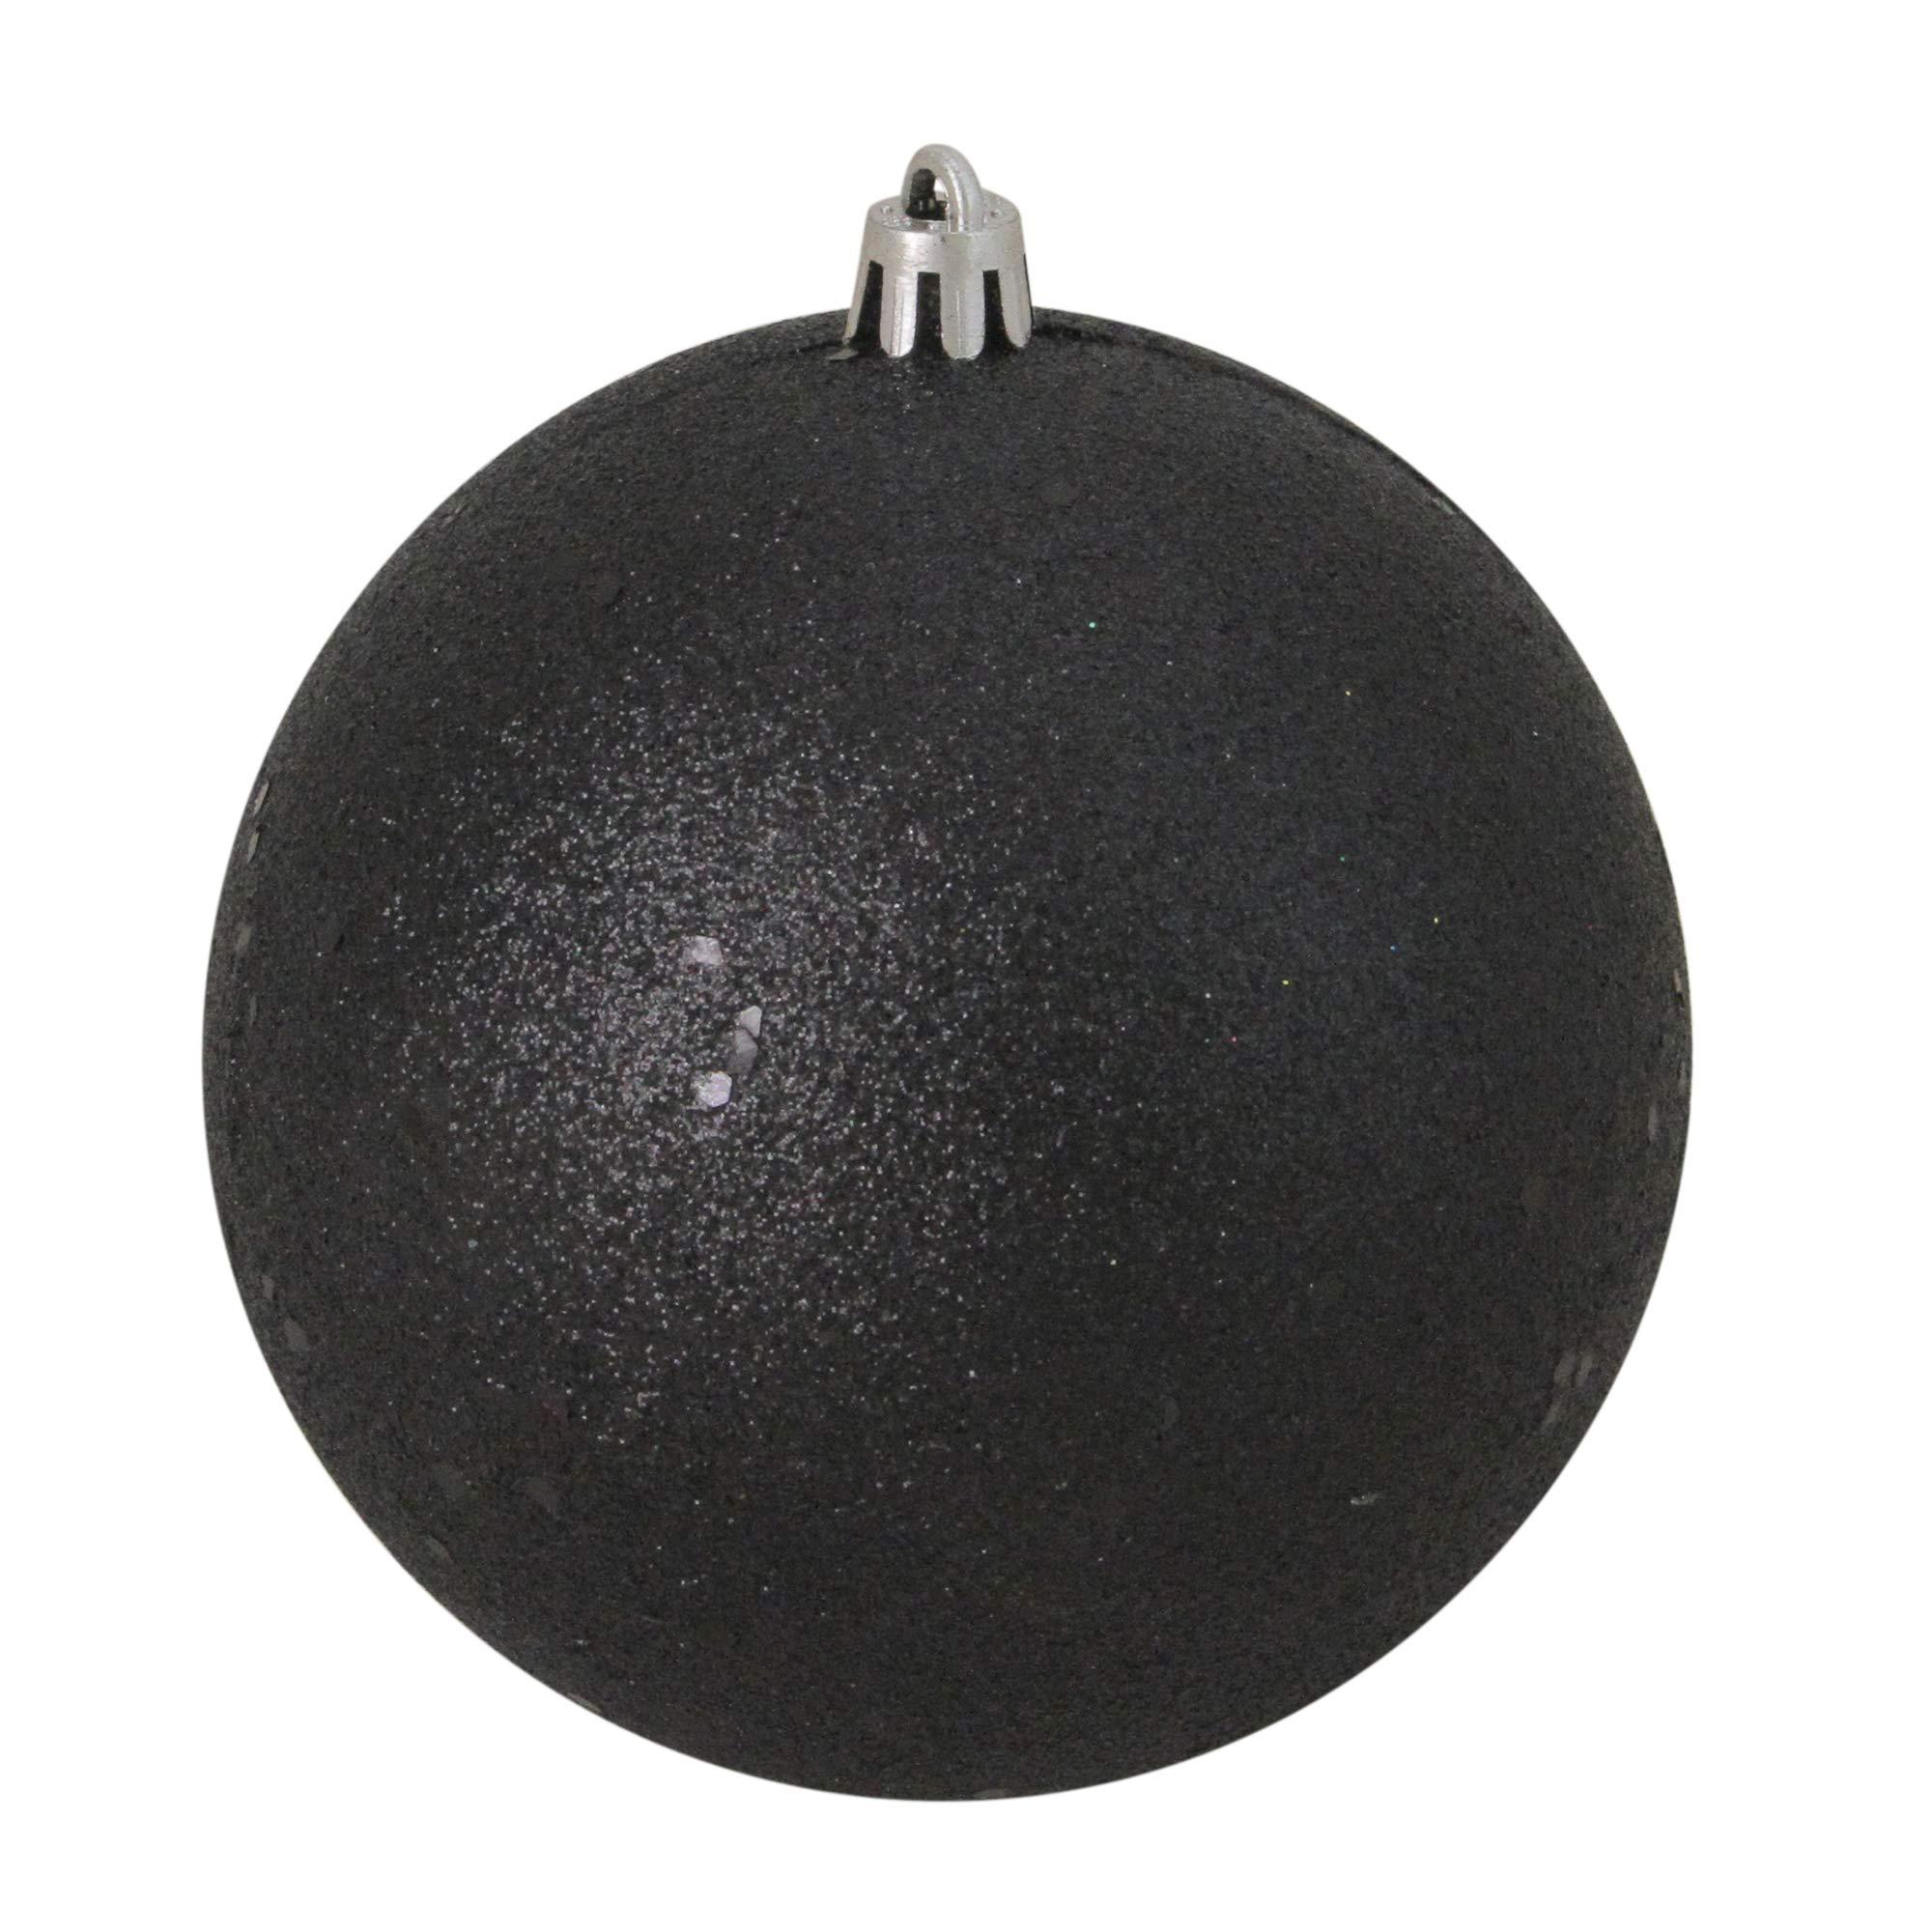 Northlight Jet Black Shatterproof Holographic Glitter Christmas Ball Ornament 4'' (100mm)